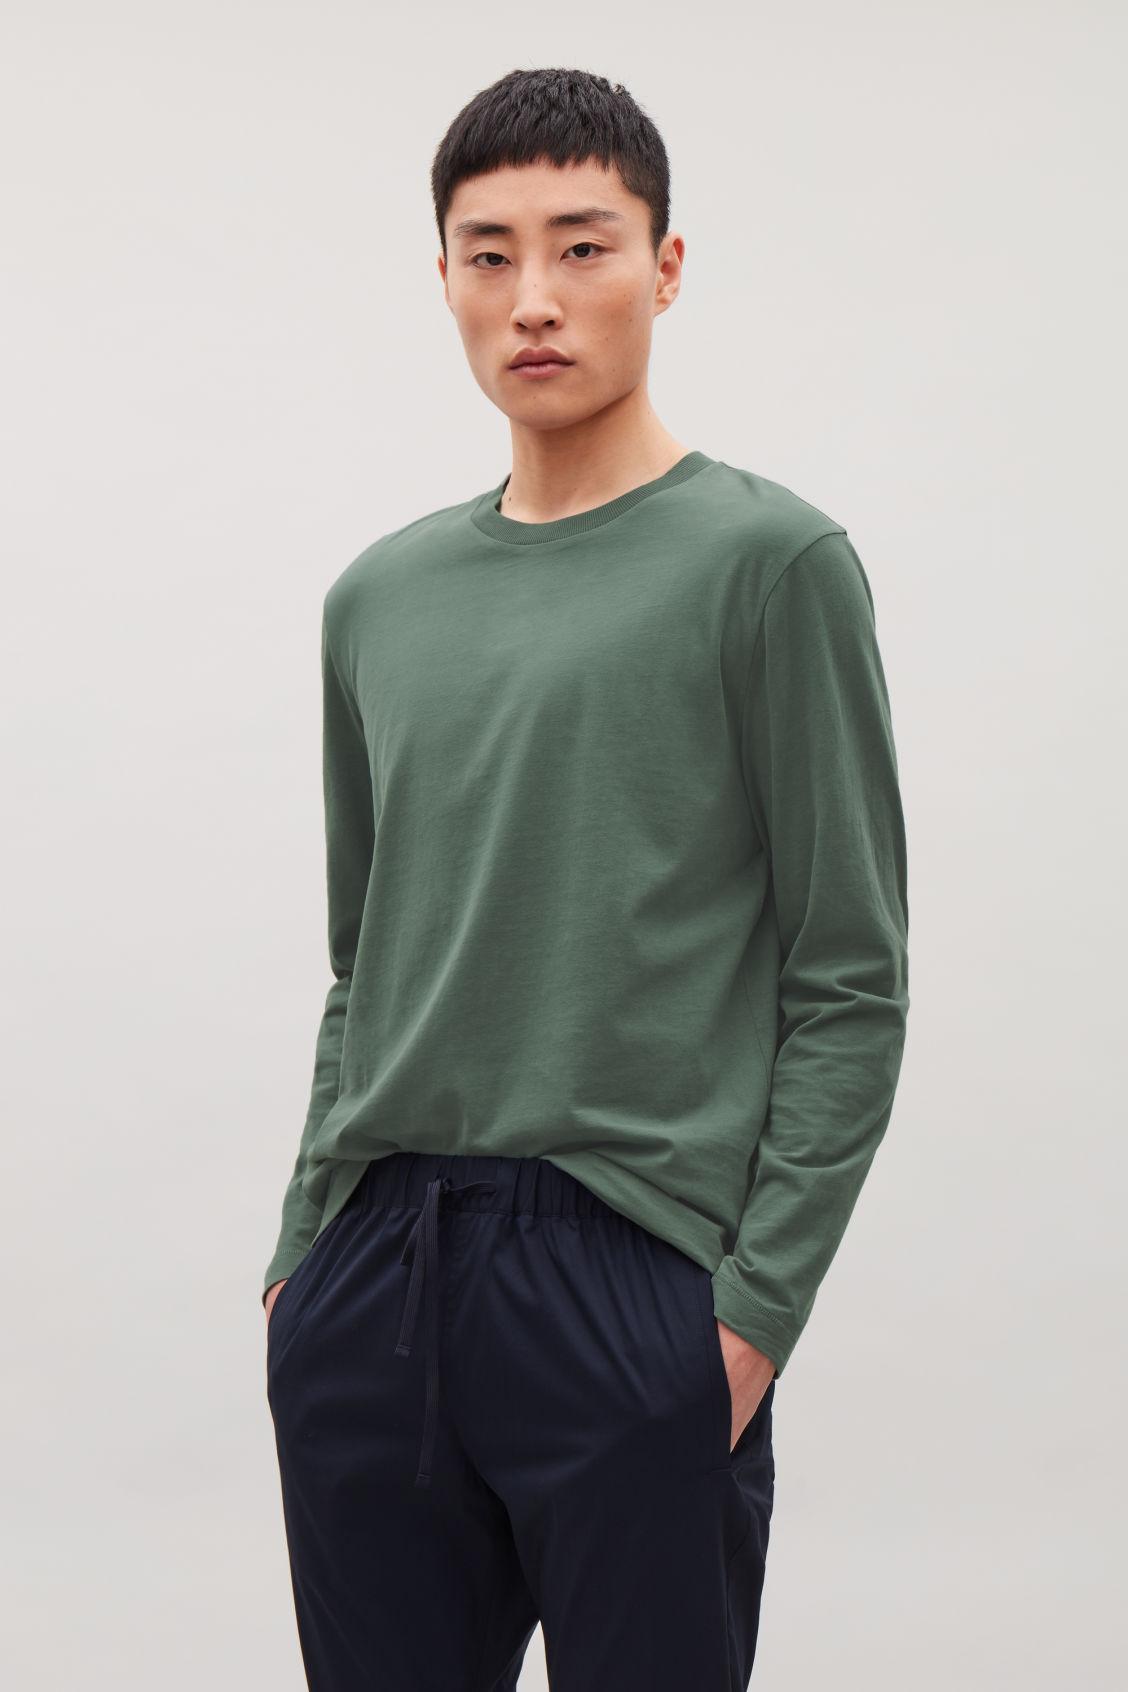 Long Sleeved Cotton T Shirt Khaki Green Long Sleeve T